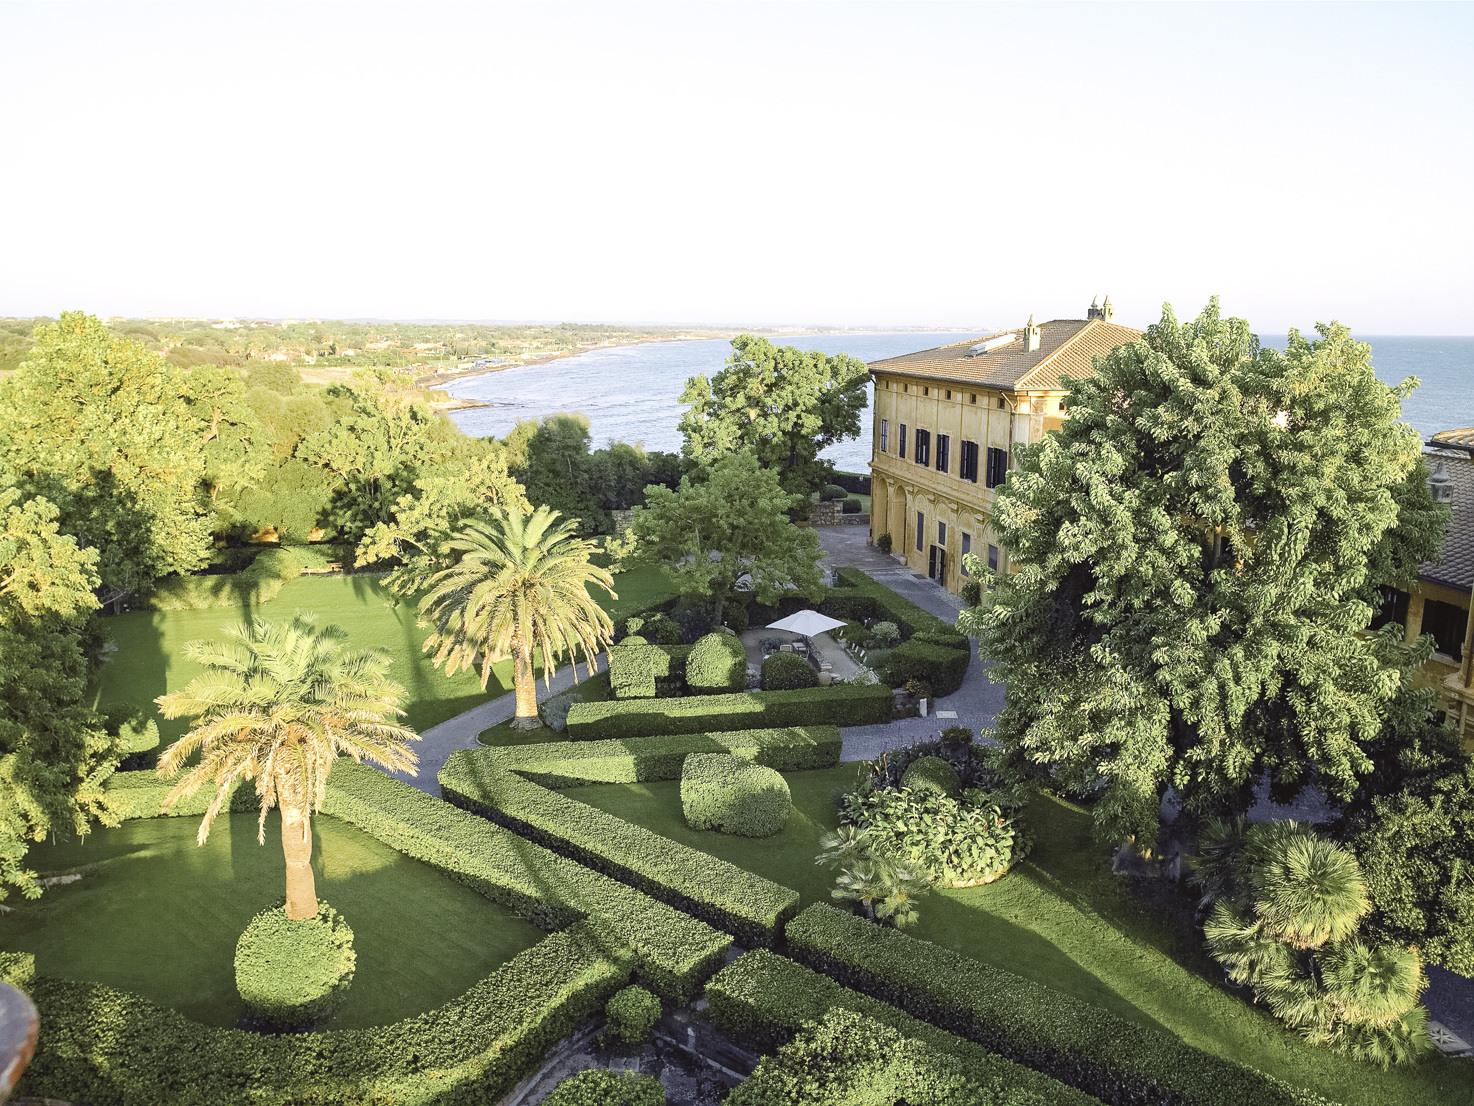 Aerial view of La Posta Vecchia and the park